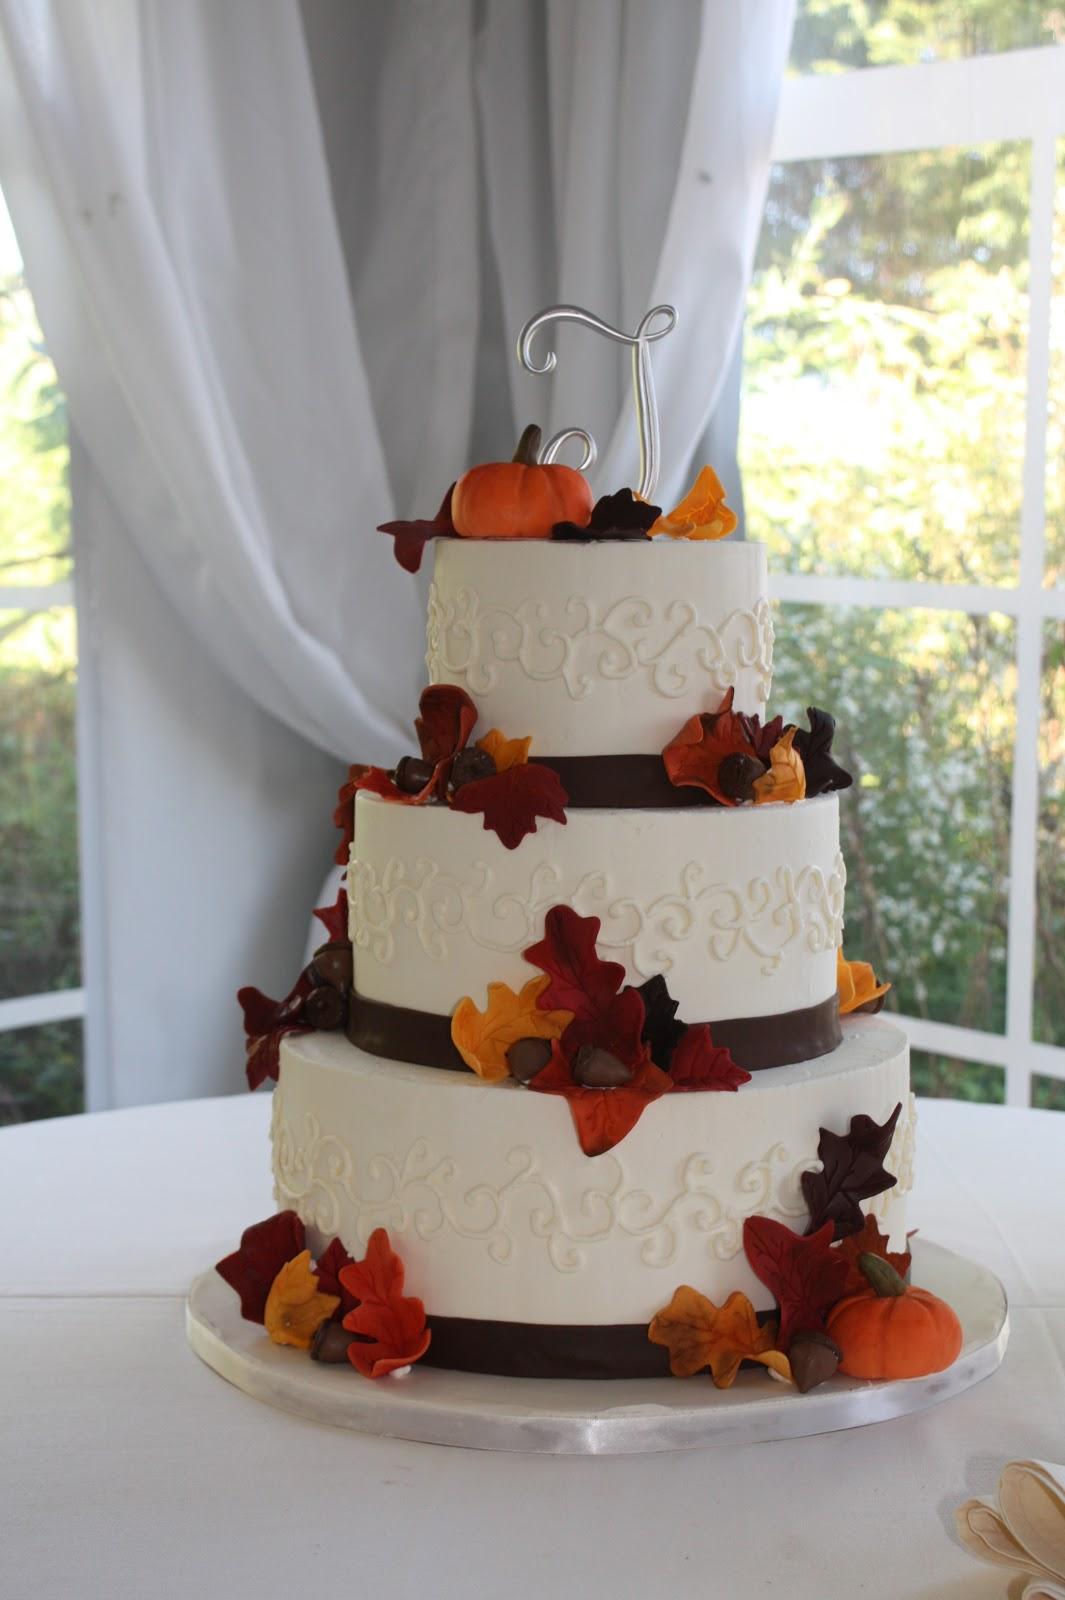 Sweet Eats Cakes Recent Wedding Cakes